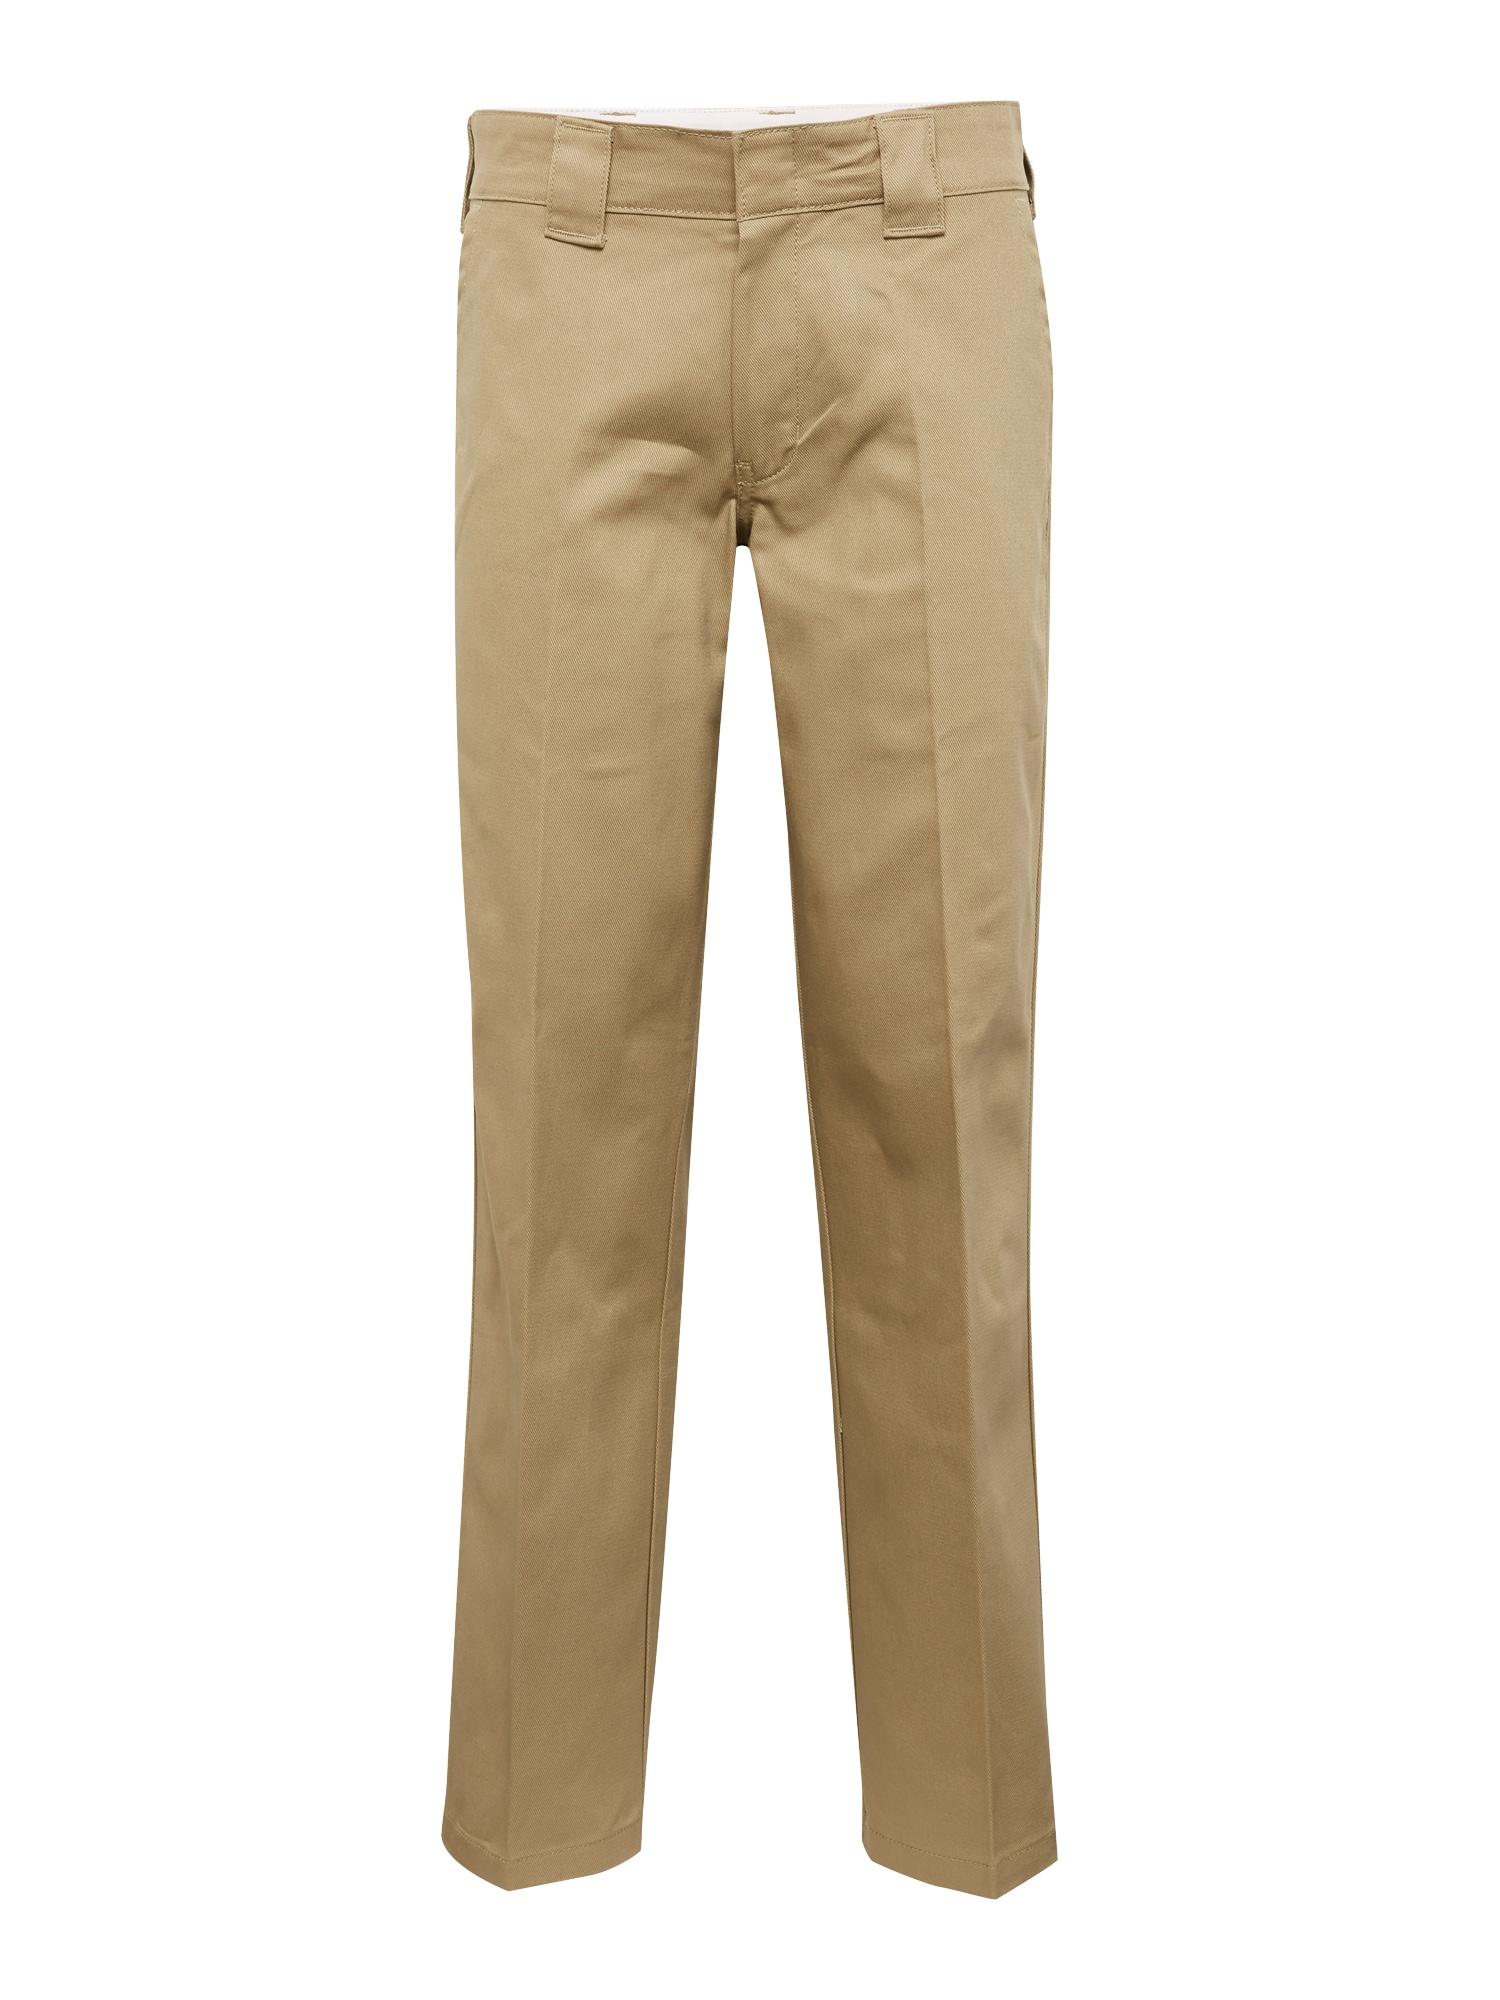 Kalhoty s puky Cotton 873 dunkelbeige DICKIES